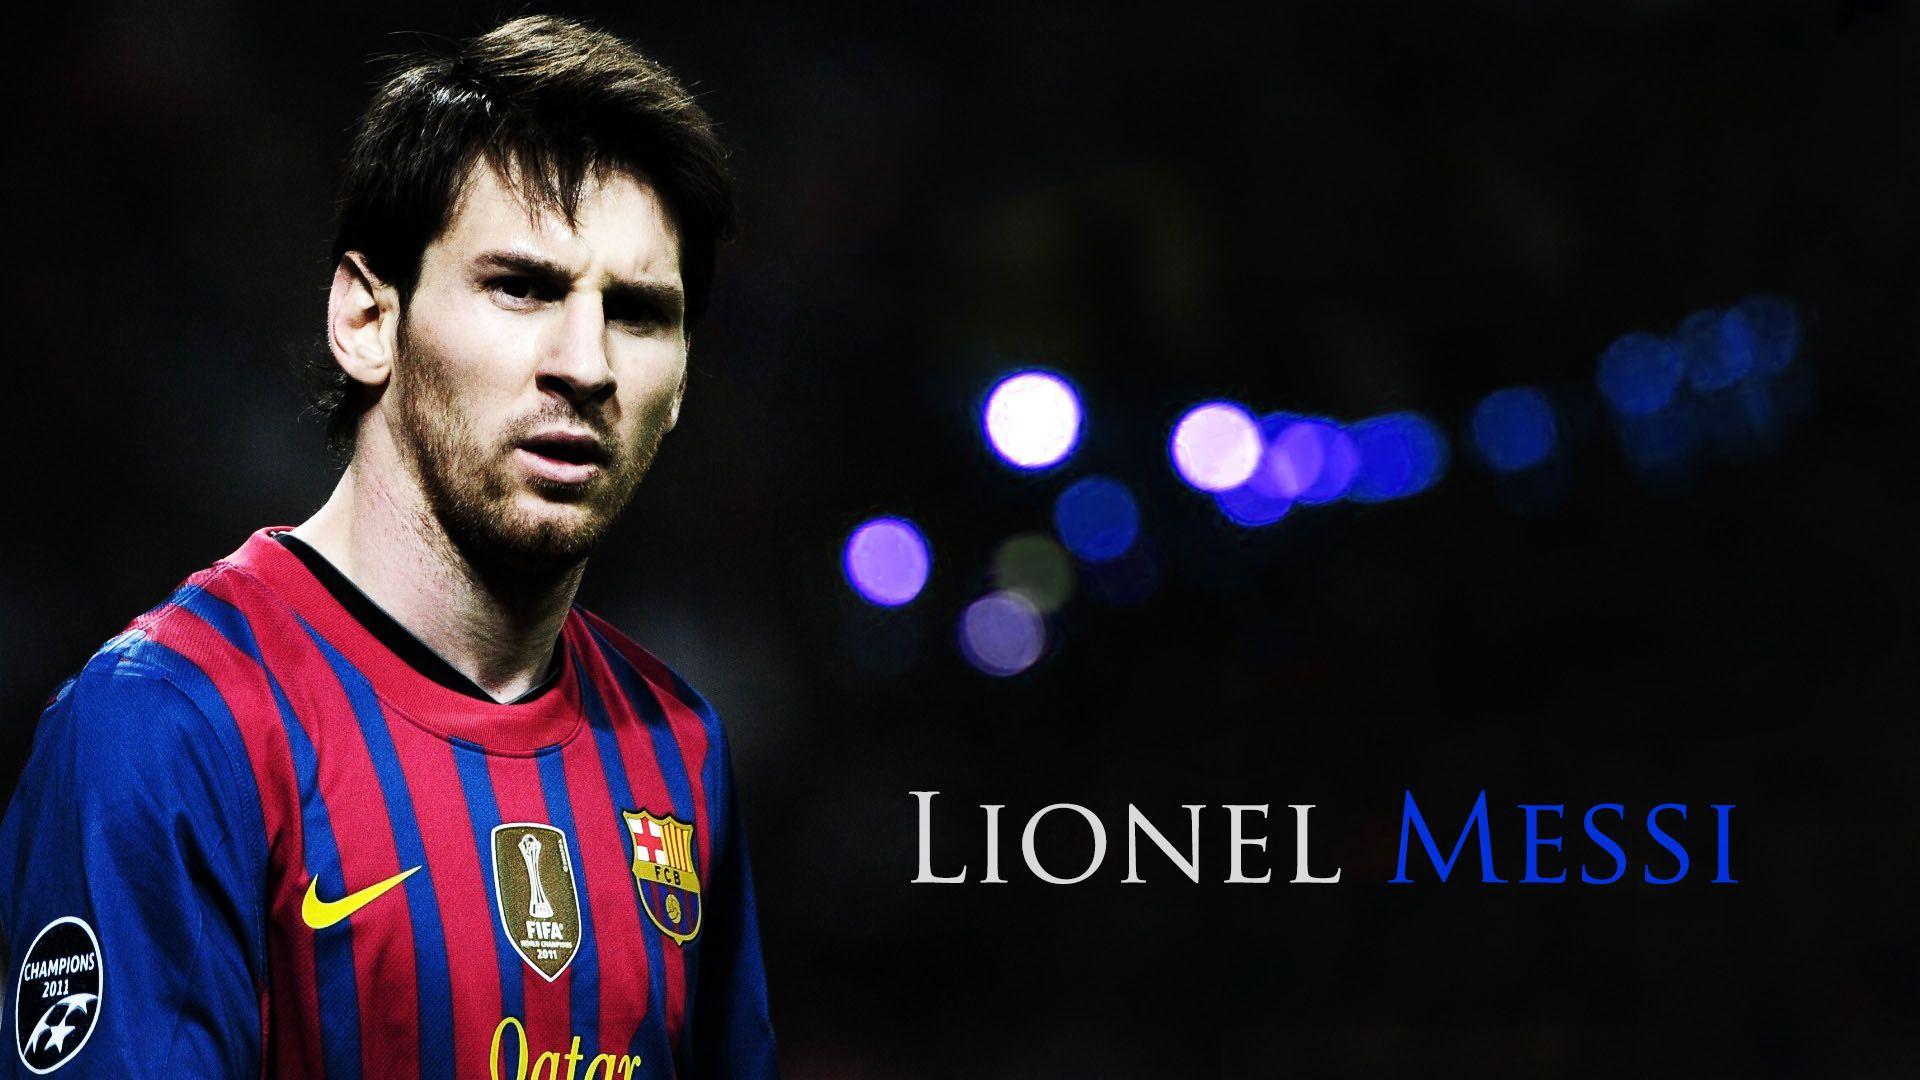 Messi Desktop Background Wallpapers Backgrounds Images Art Photos Lionel Messi Lionel Messi Wallpapers Lionel Messi Barcelona